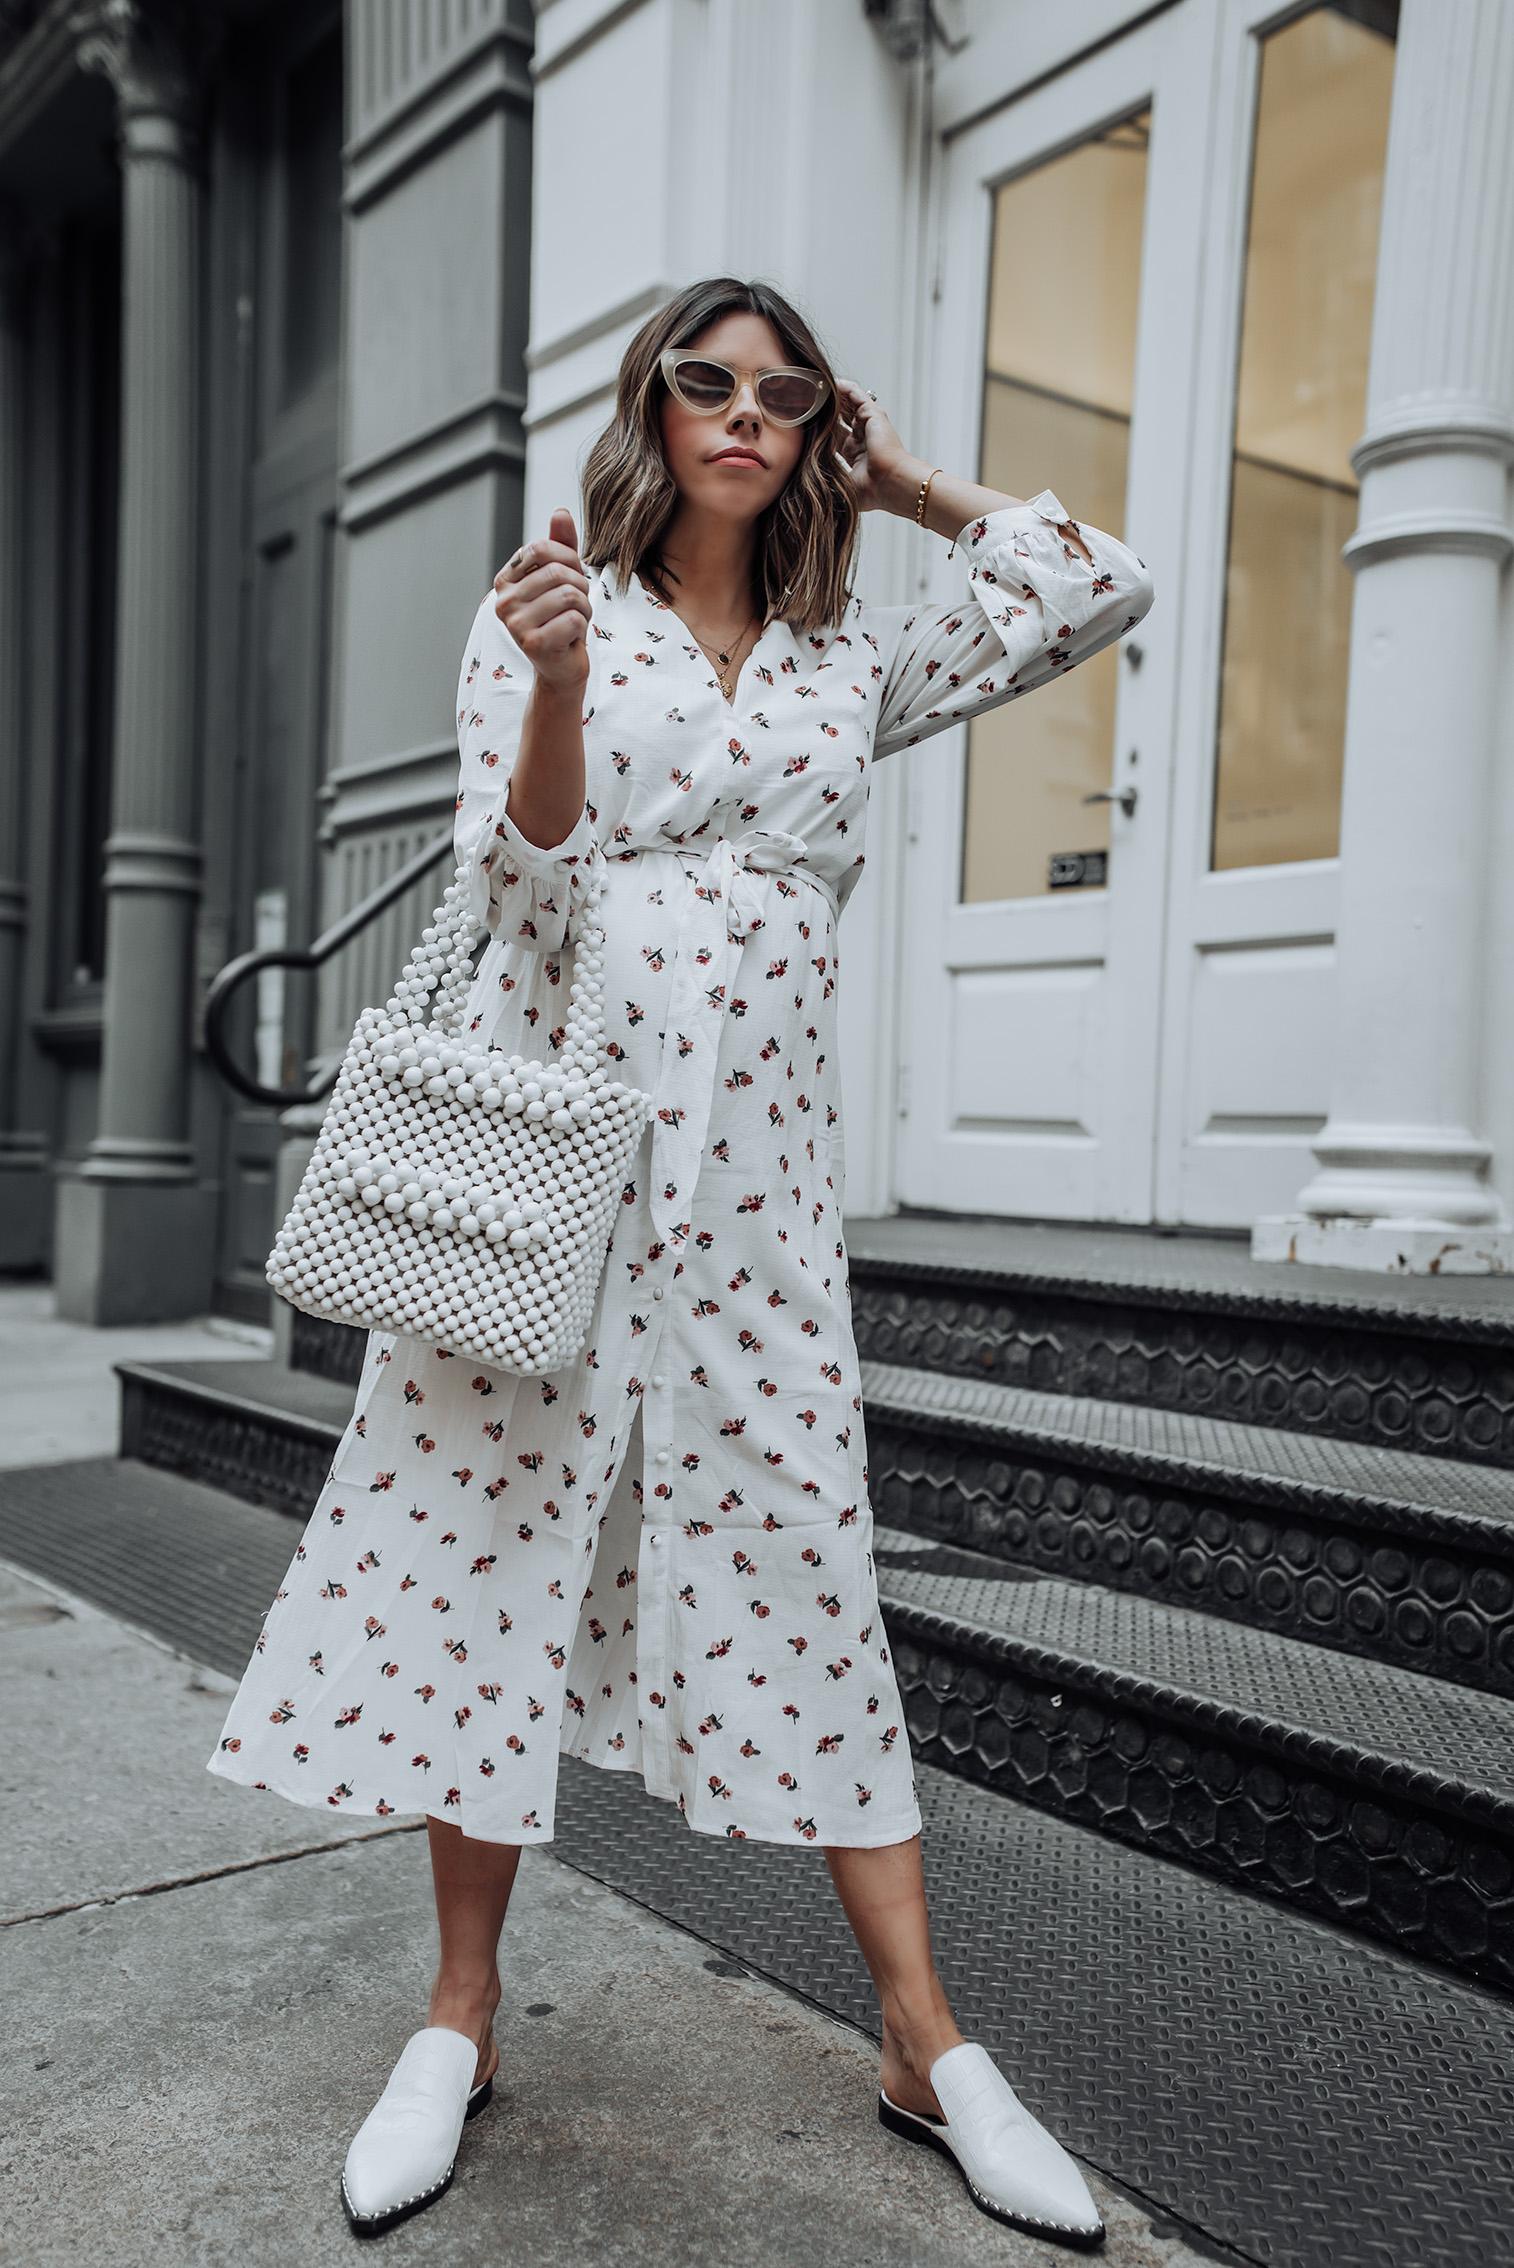 All white | Midi Wrap Dress | Sigerson Morrison Elana Point Slides | Beaded Bag |